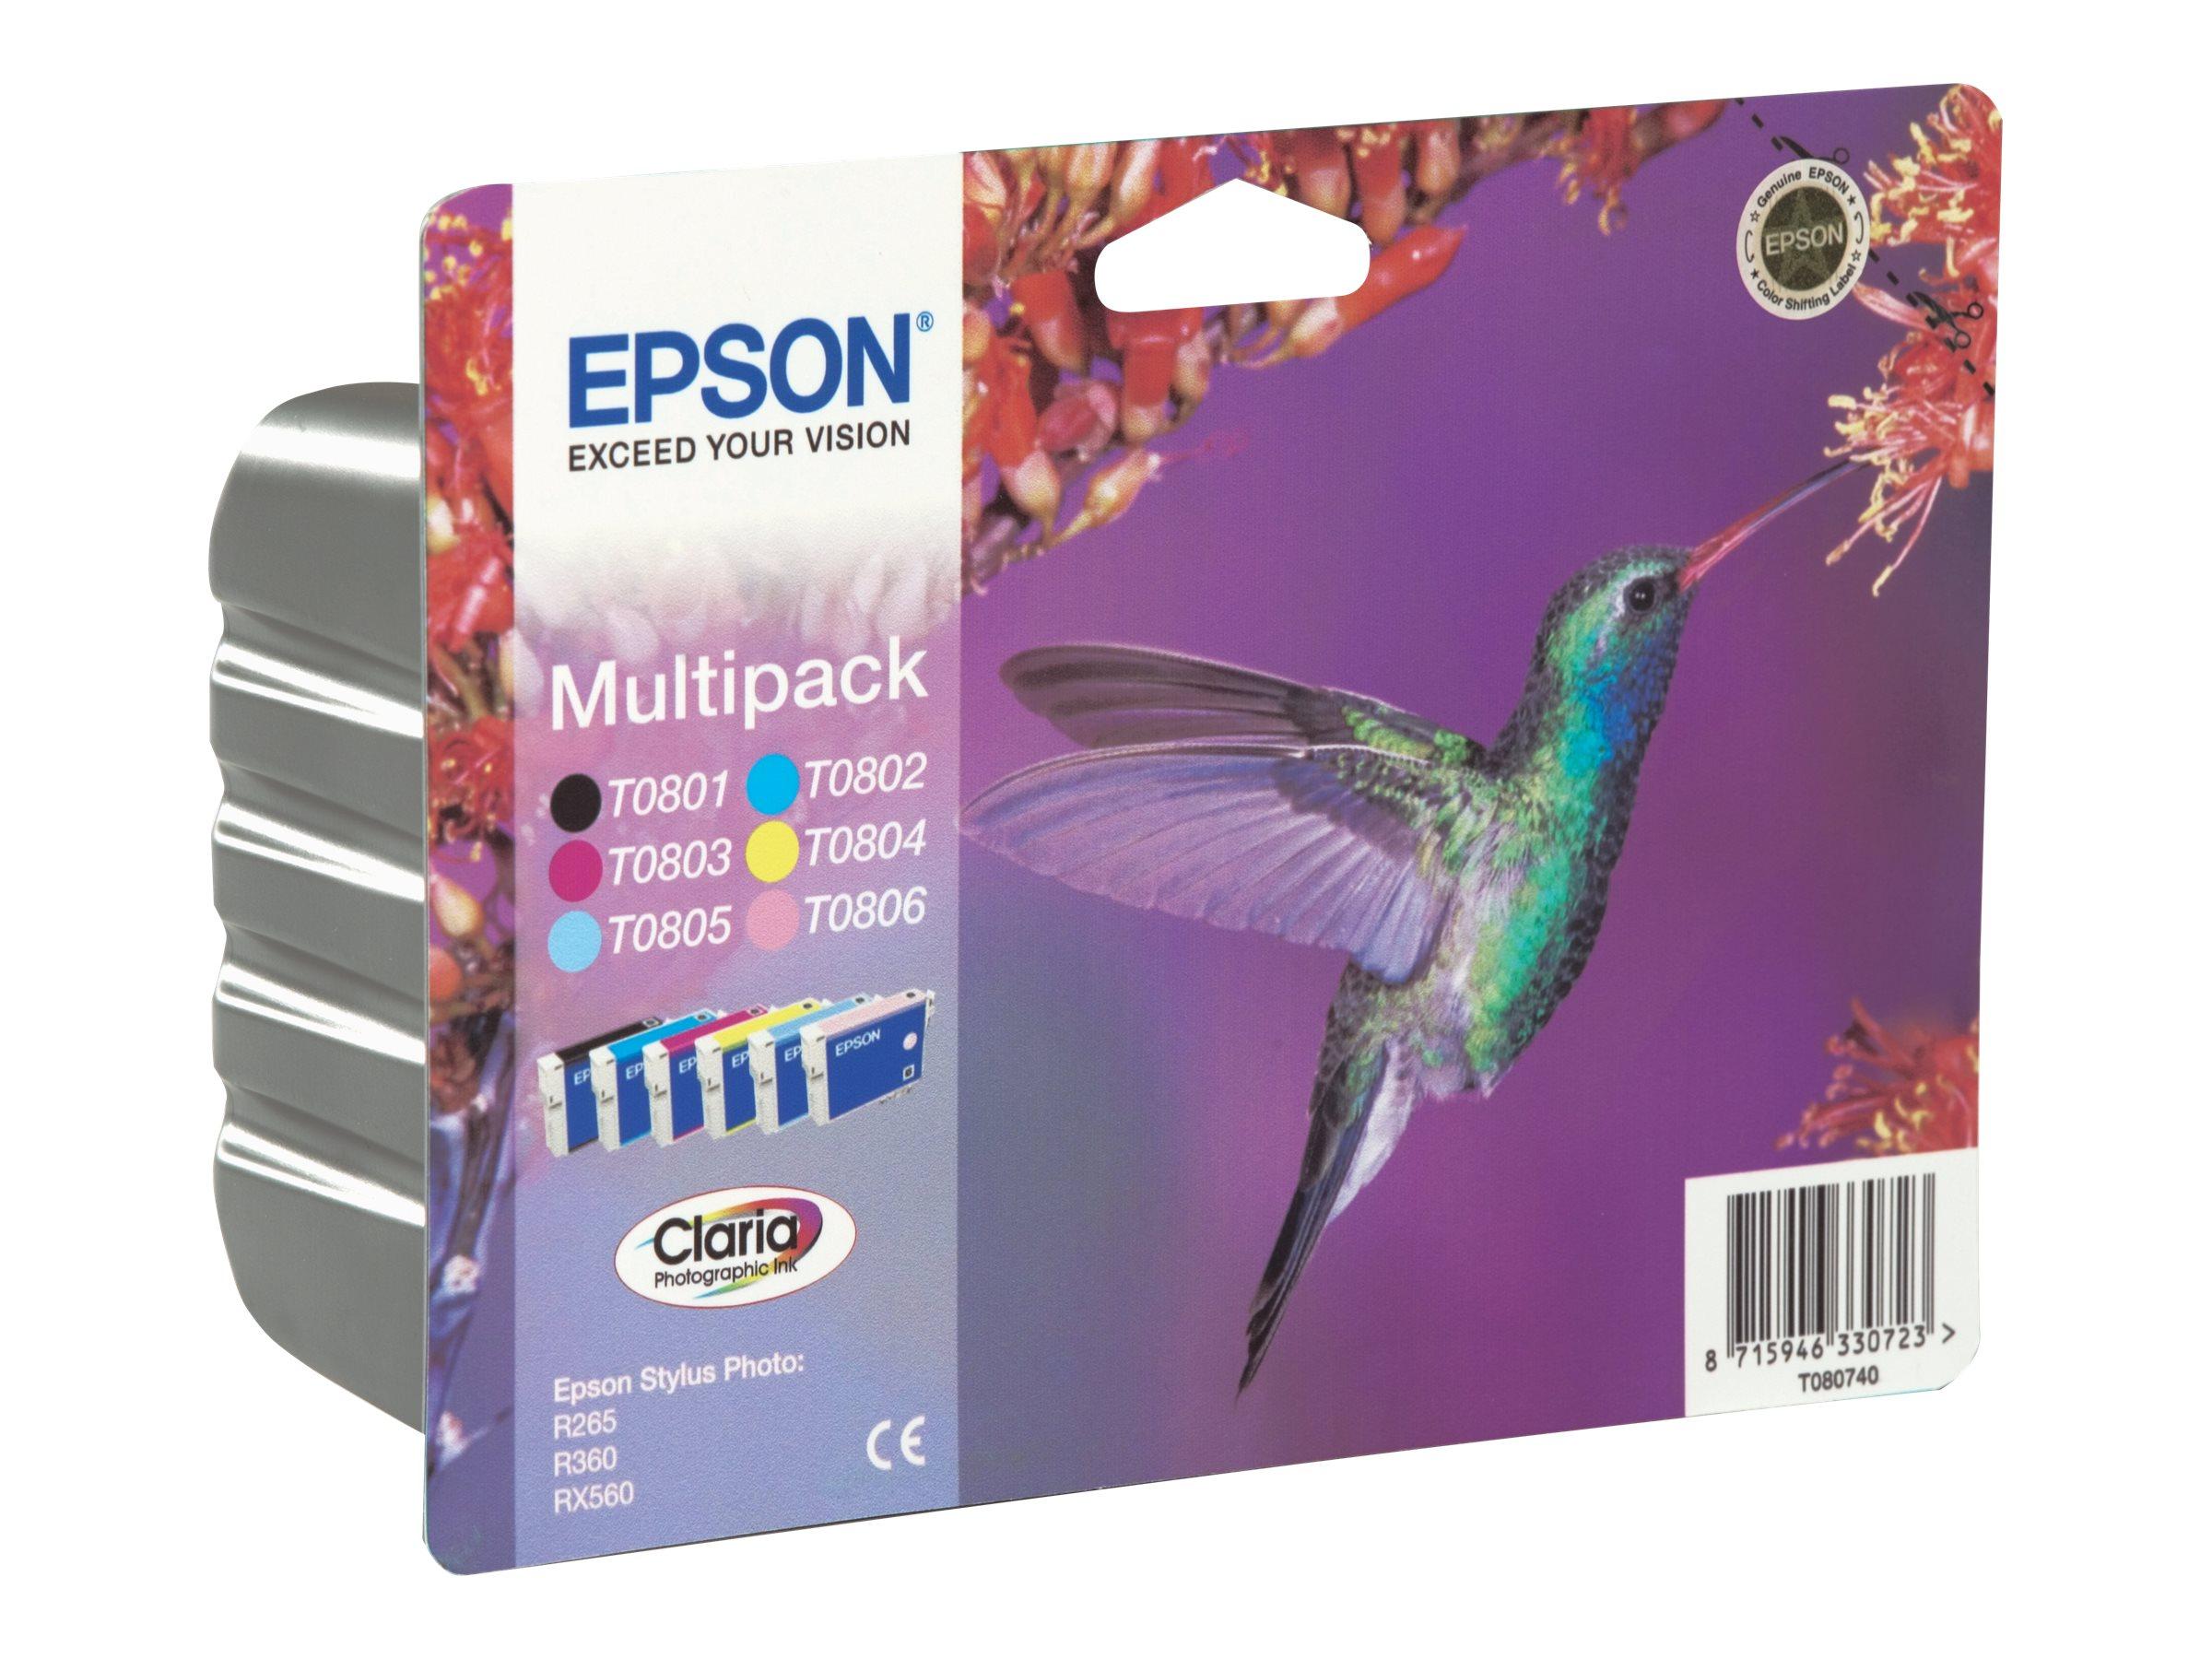 Epson T0807 Multipack - Schwarz, Gelb, Cyan, Magenta, hellmagentafarben, hell Cyan